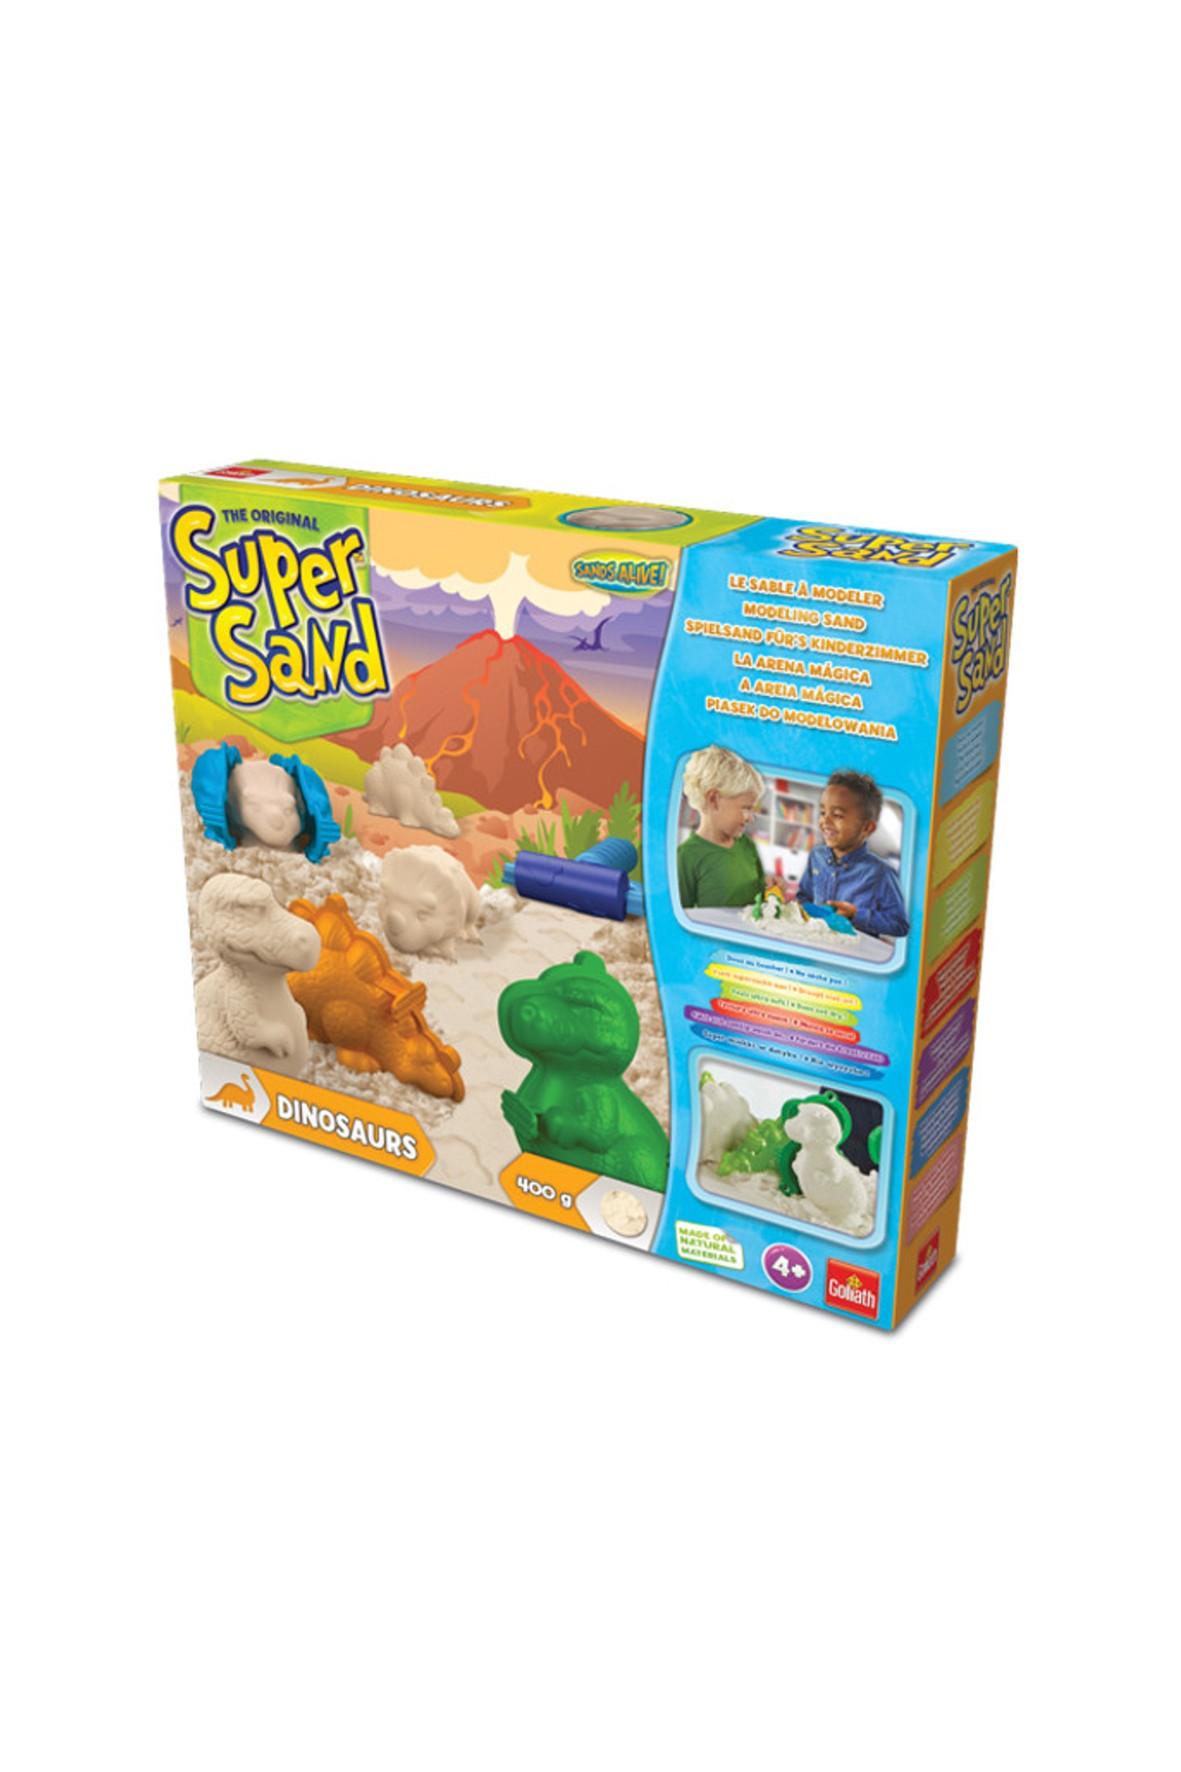 Super Sand Dinosaurs